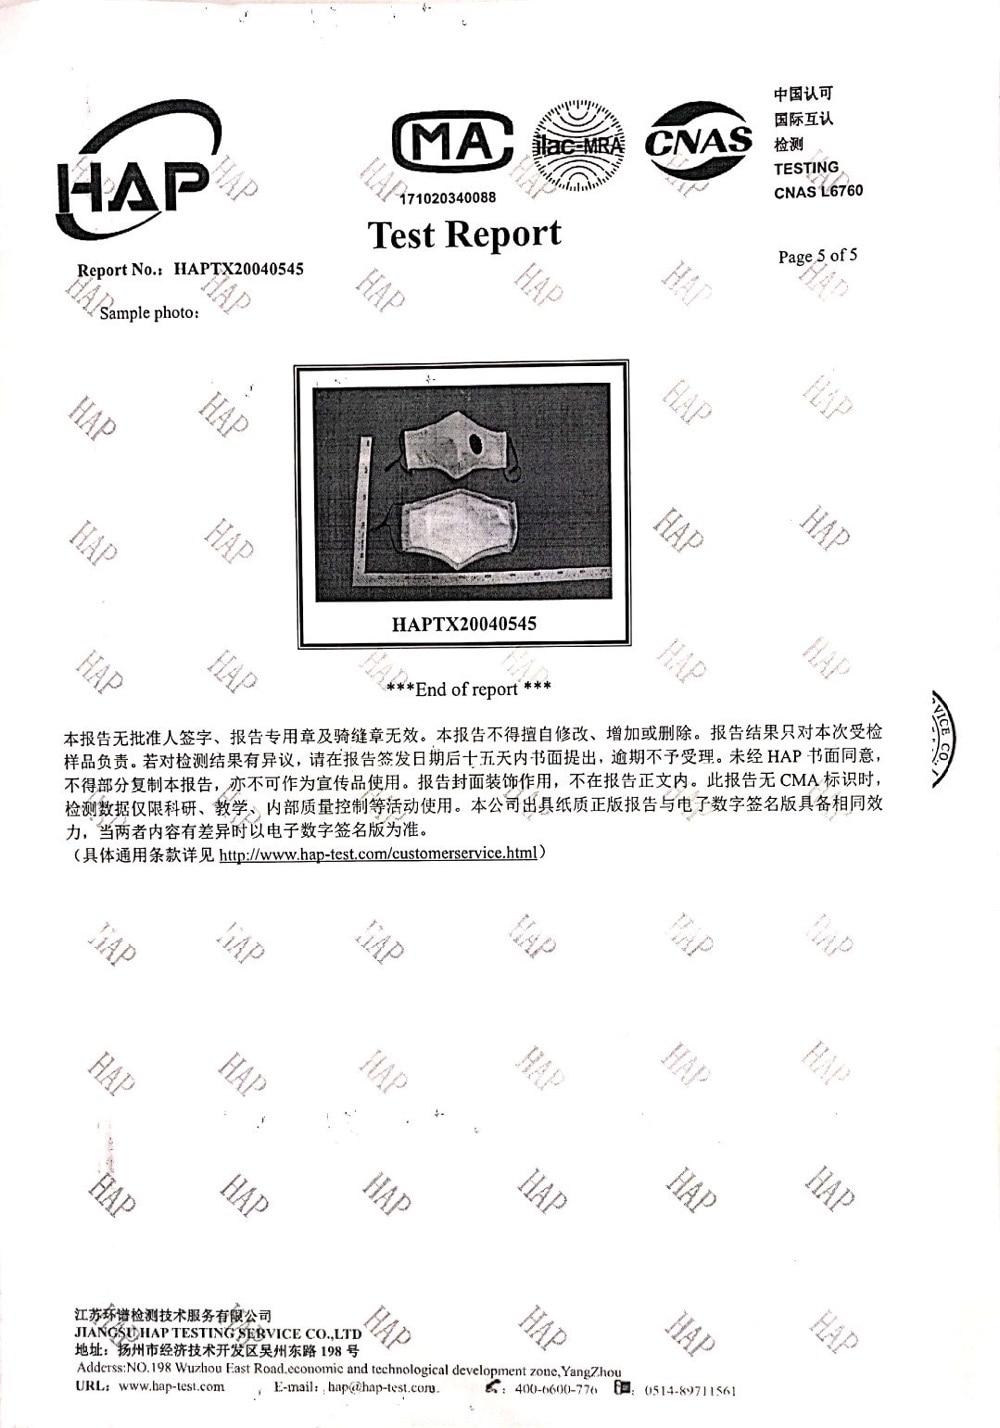 0C7BF4F6-DF73-4966-AC77-930F50F06370